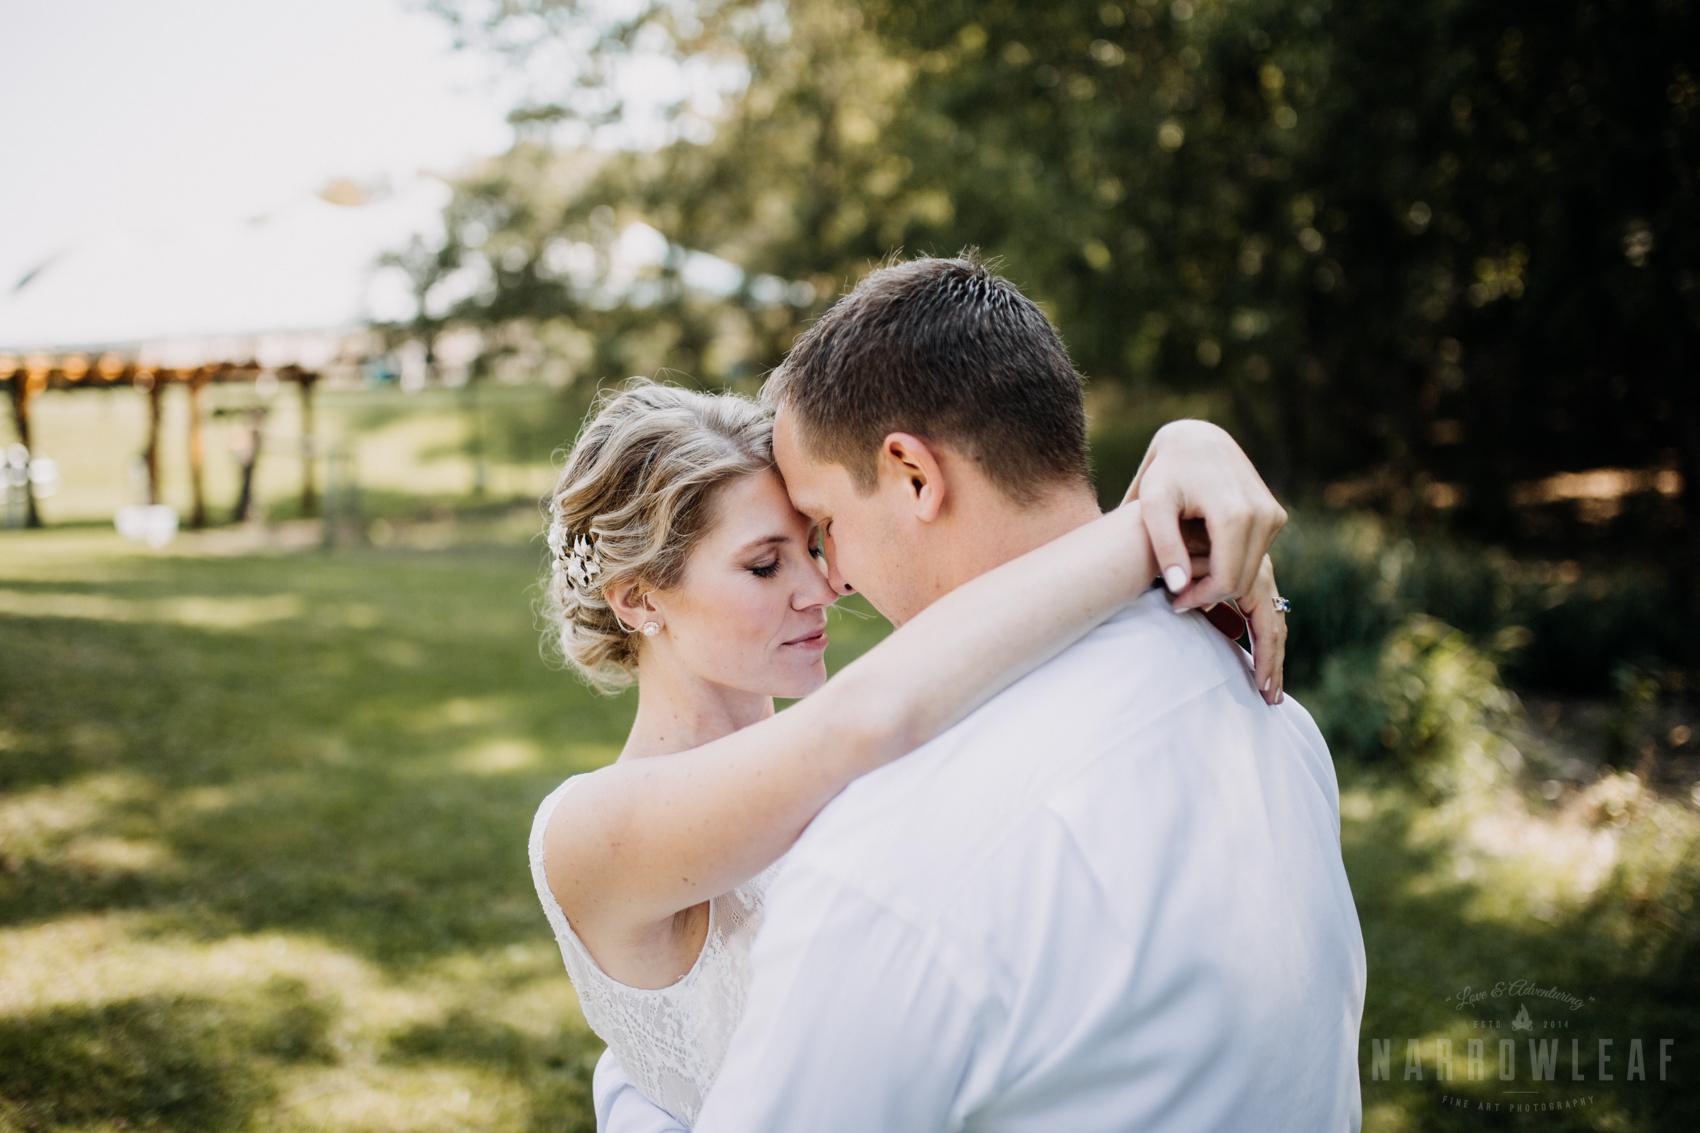 bride-groom-classy-wedding-photos-outdoors-35.jpg